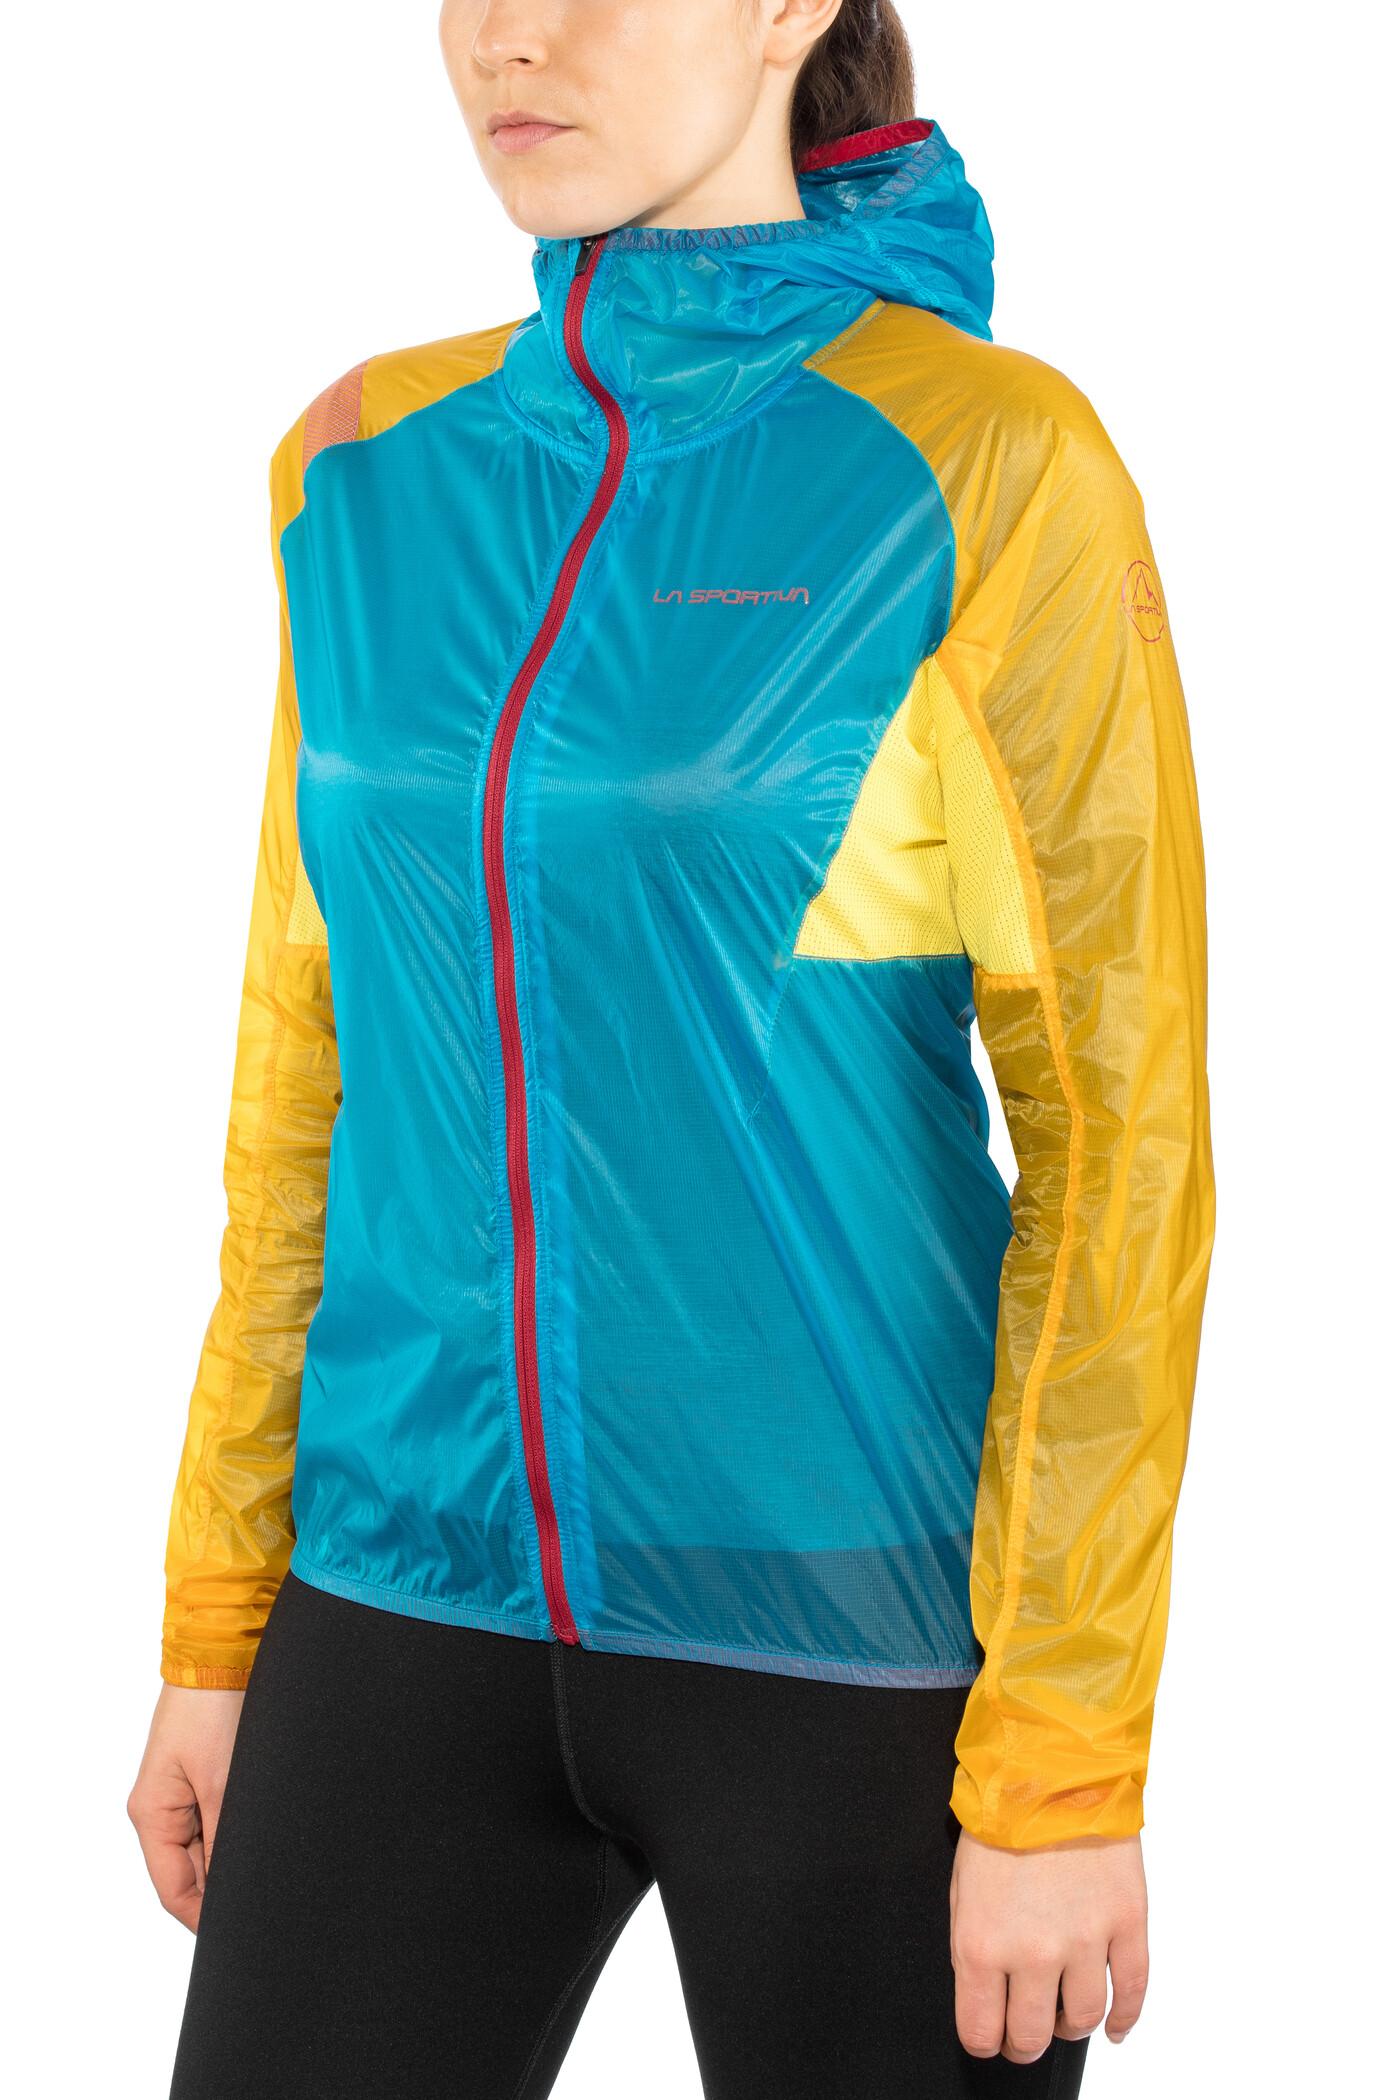 La Sportiva Running günstig kaufen | bikester.at